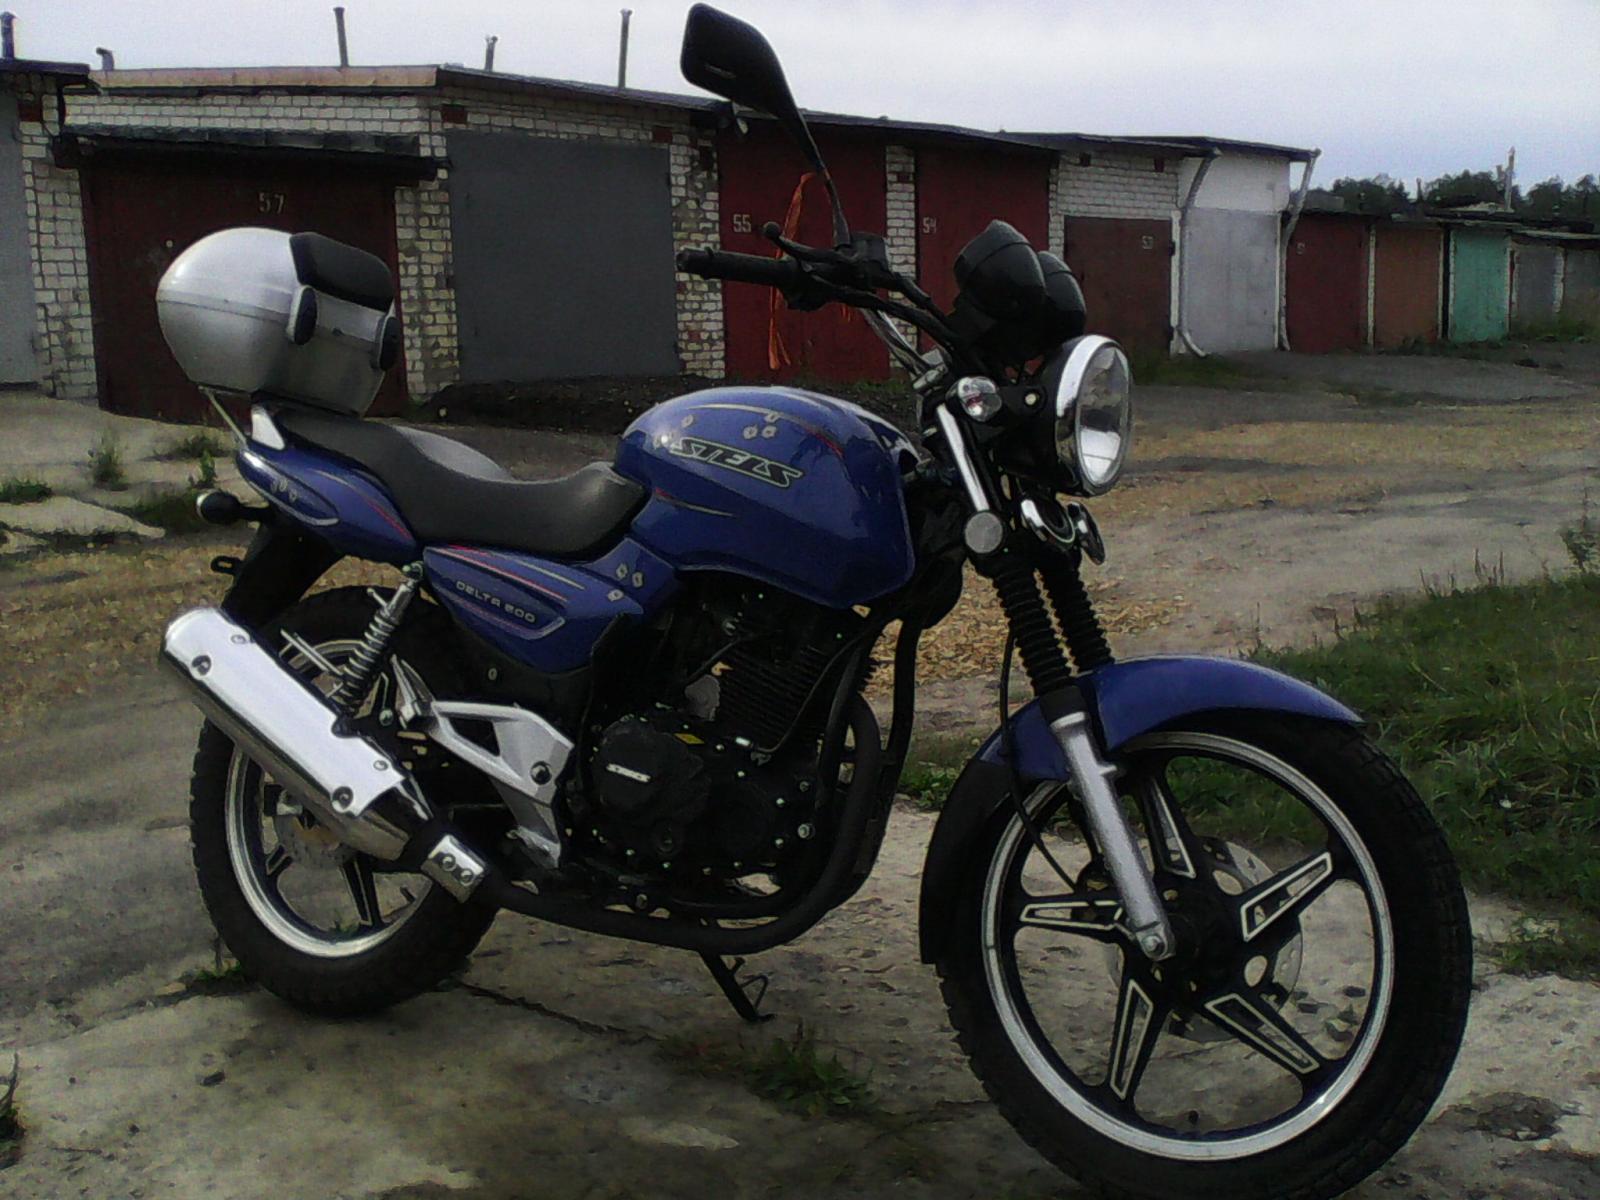 инструкция эксплуатация мотоцикла омакс 150